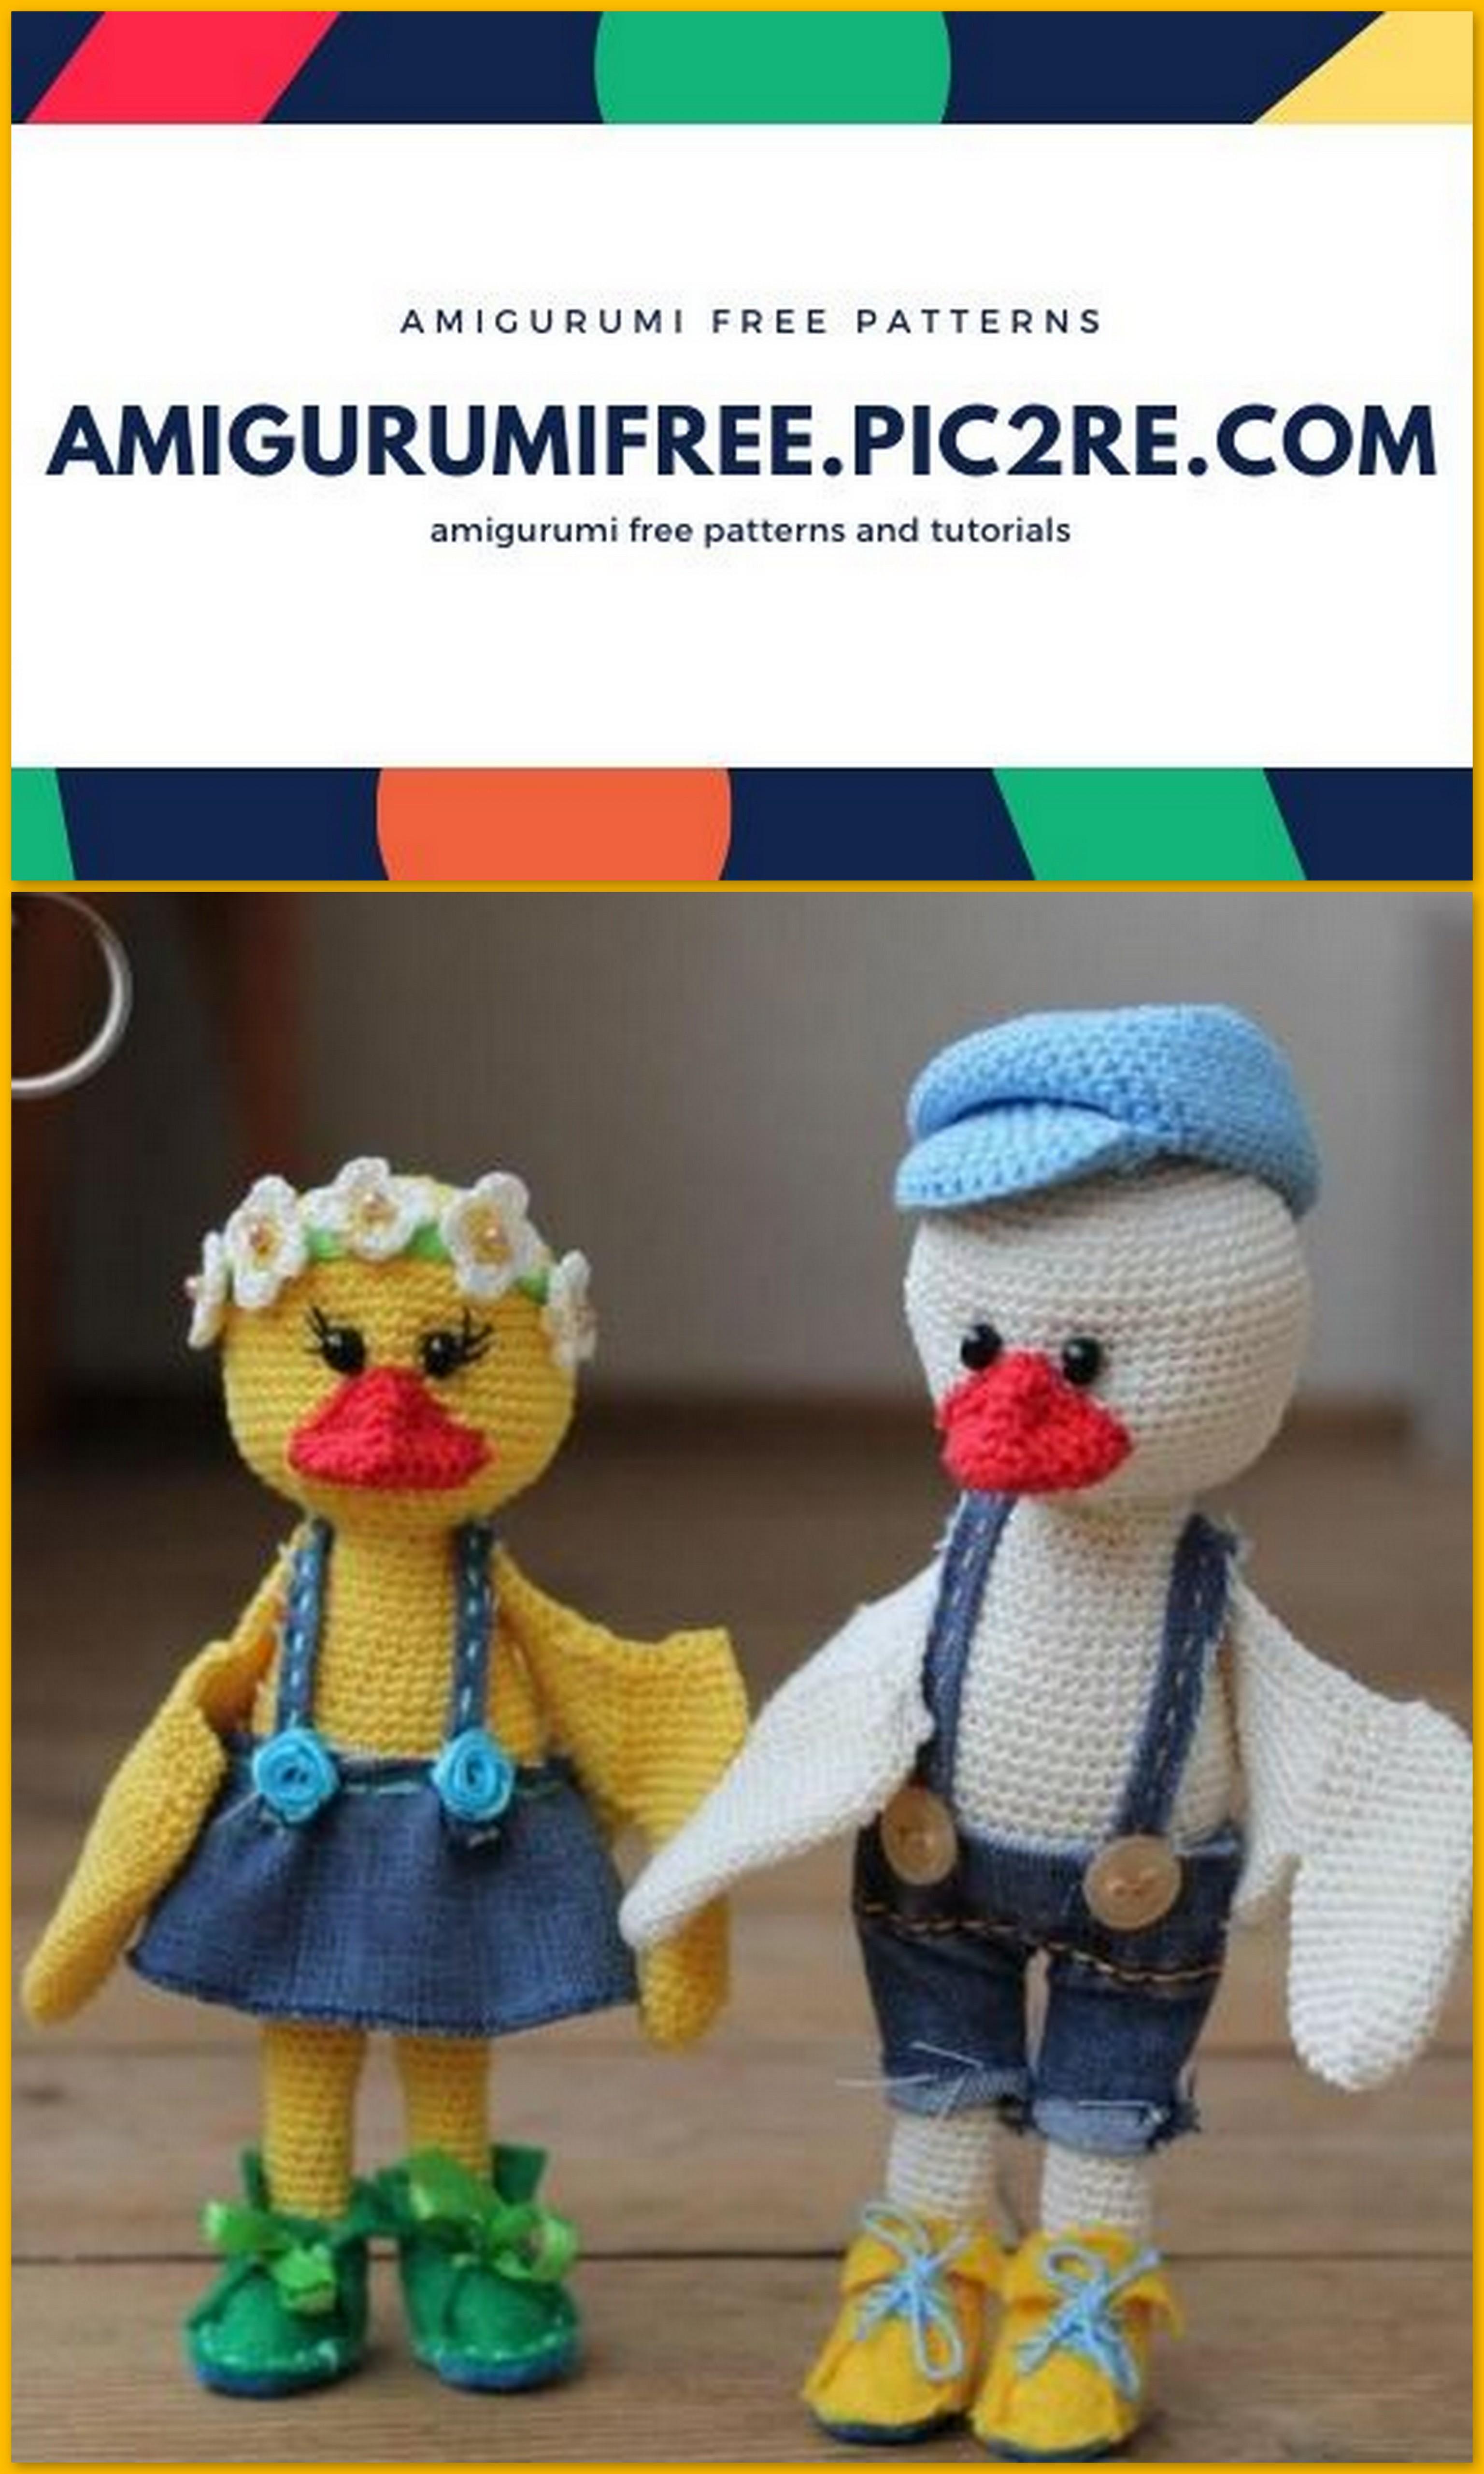 Baby Knitting Patterns Free Amigurumi Animal Crochet Patterns ... | 5120x3072